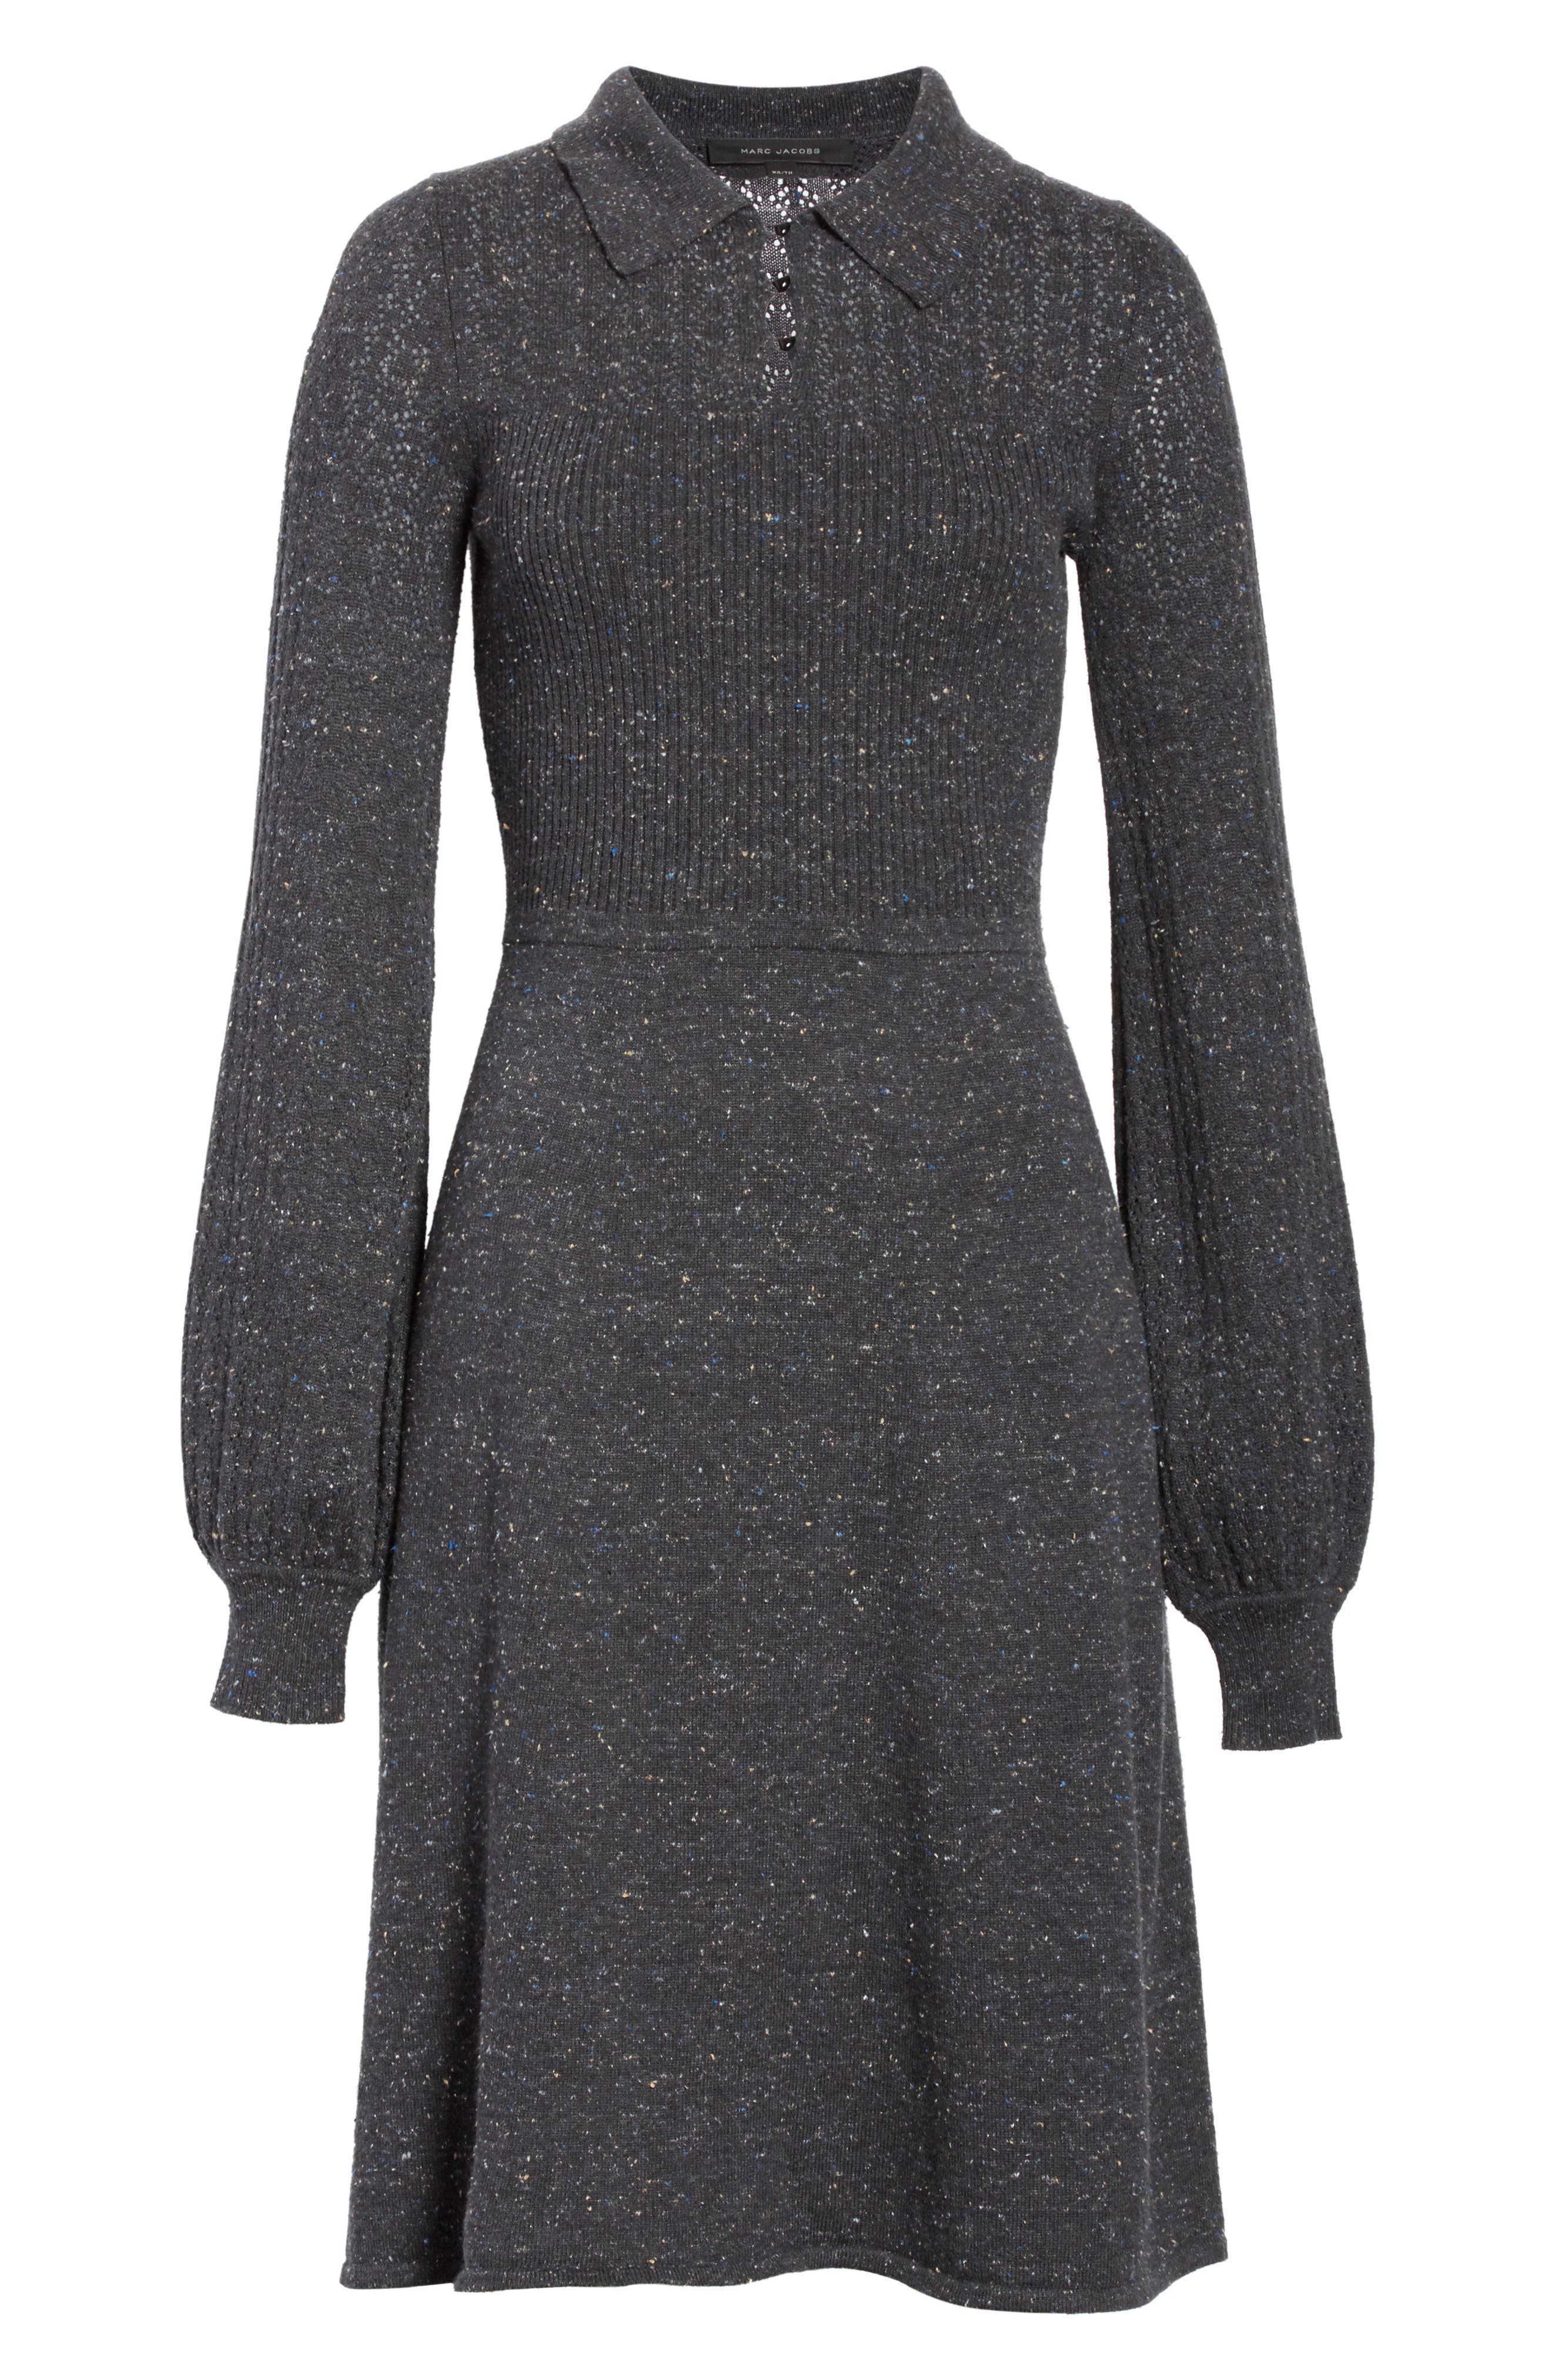 Knit Sweater Dress,                             Alternate thumbnail 7, color,                             Dark Grey